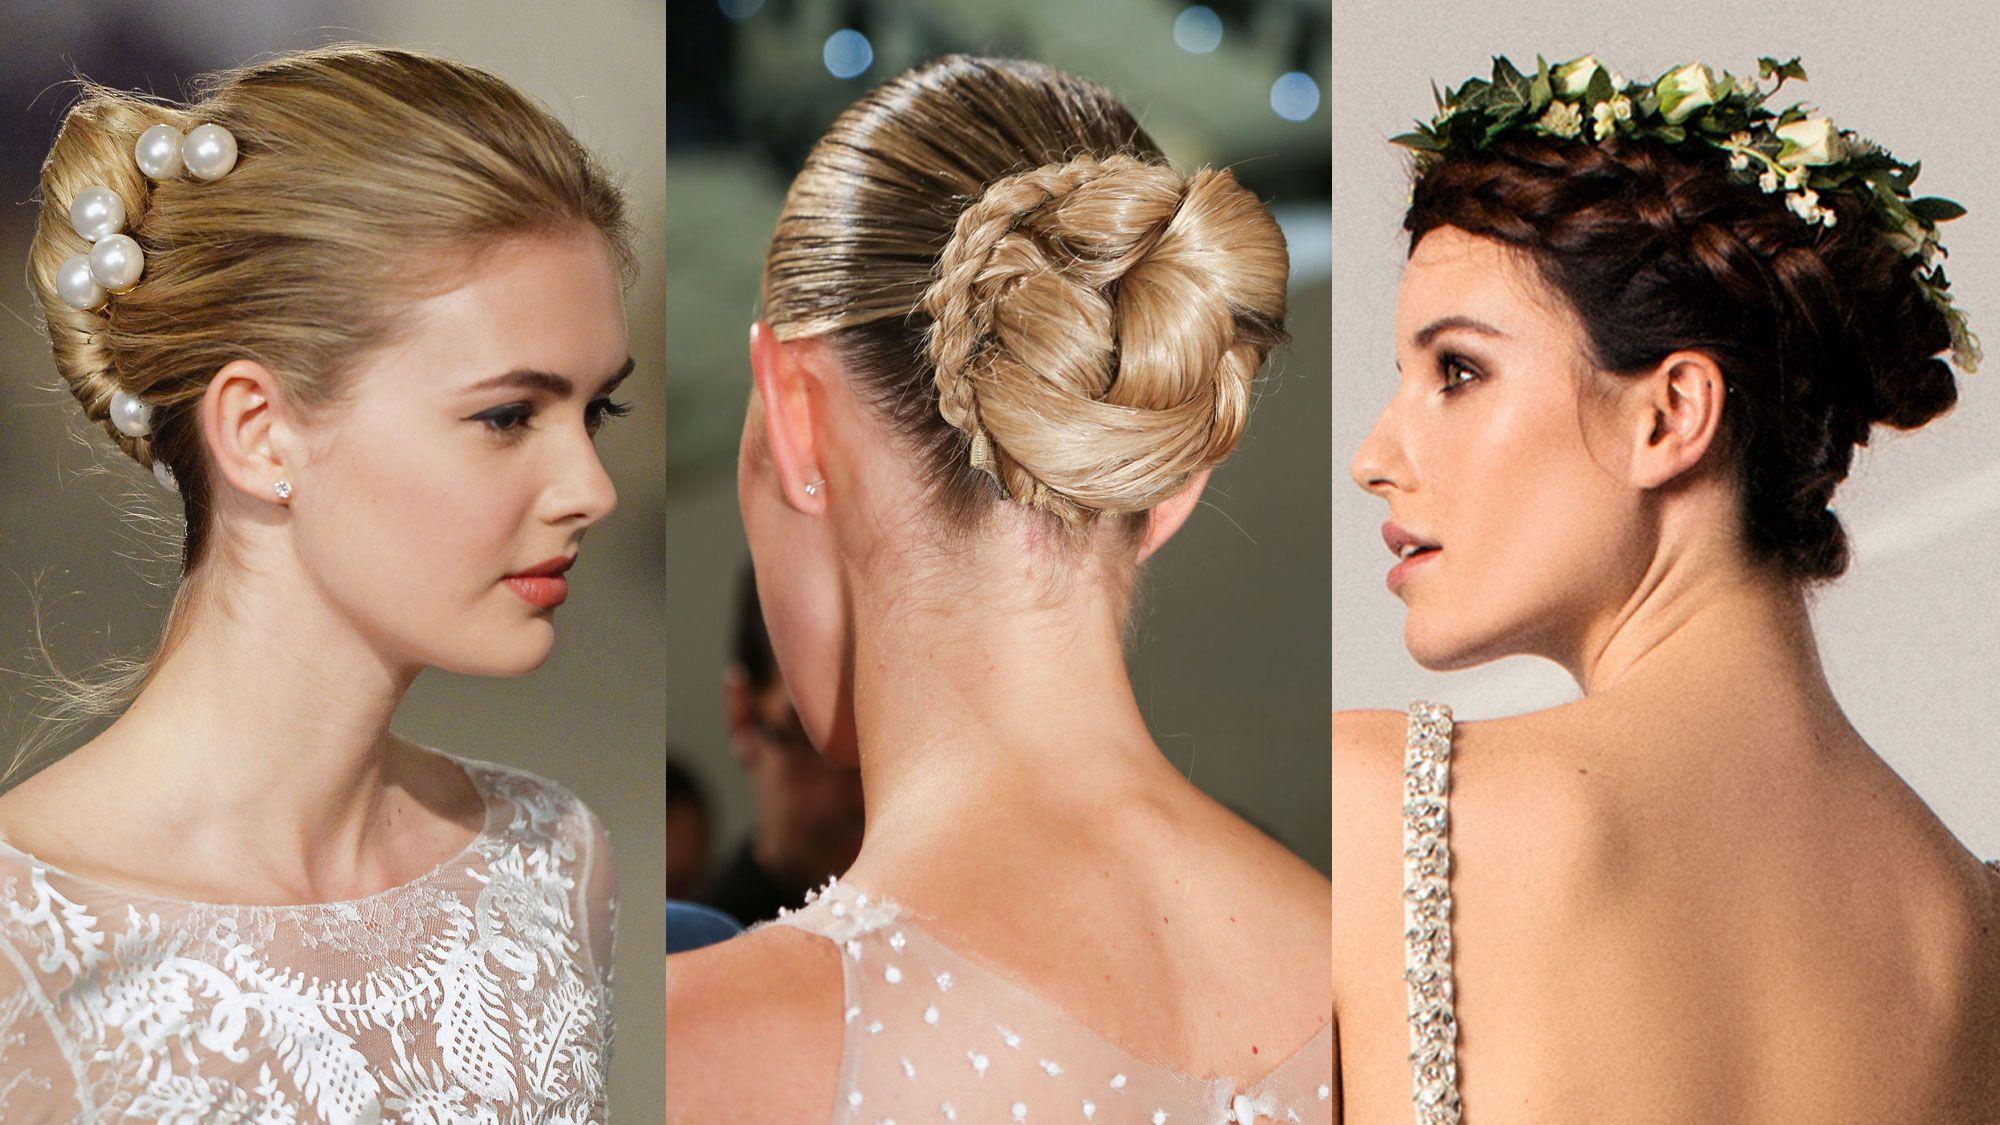 Thelist best bridal hair ideas 10 hairstyles for brides thelist best bridal hair ideas 10 hairstyles for brides urmus Choice Image